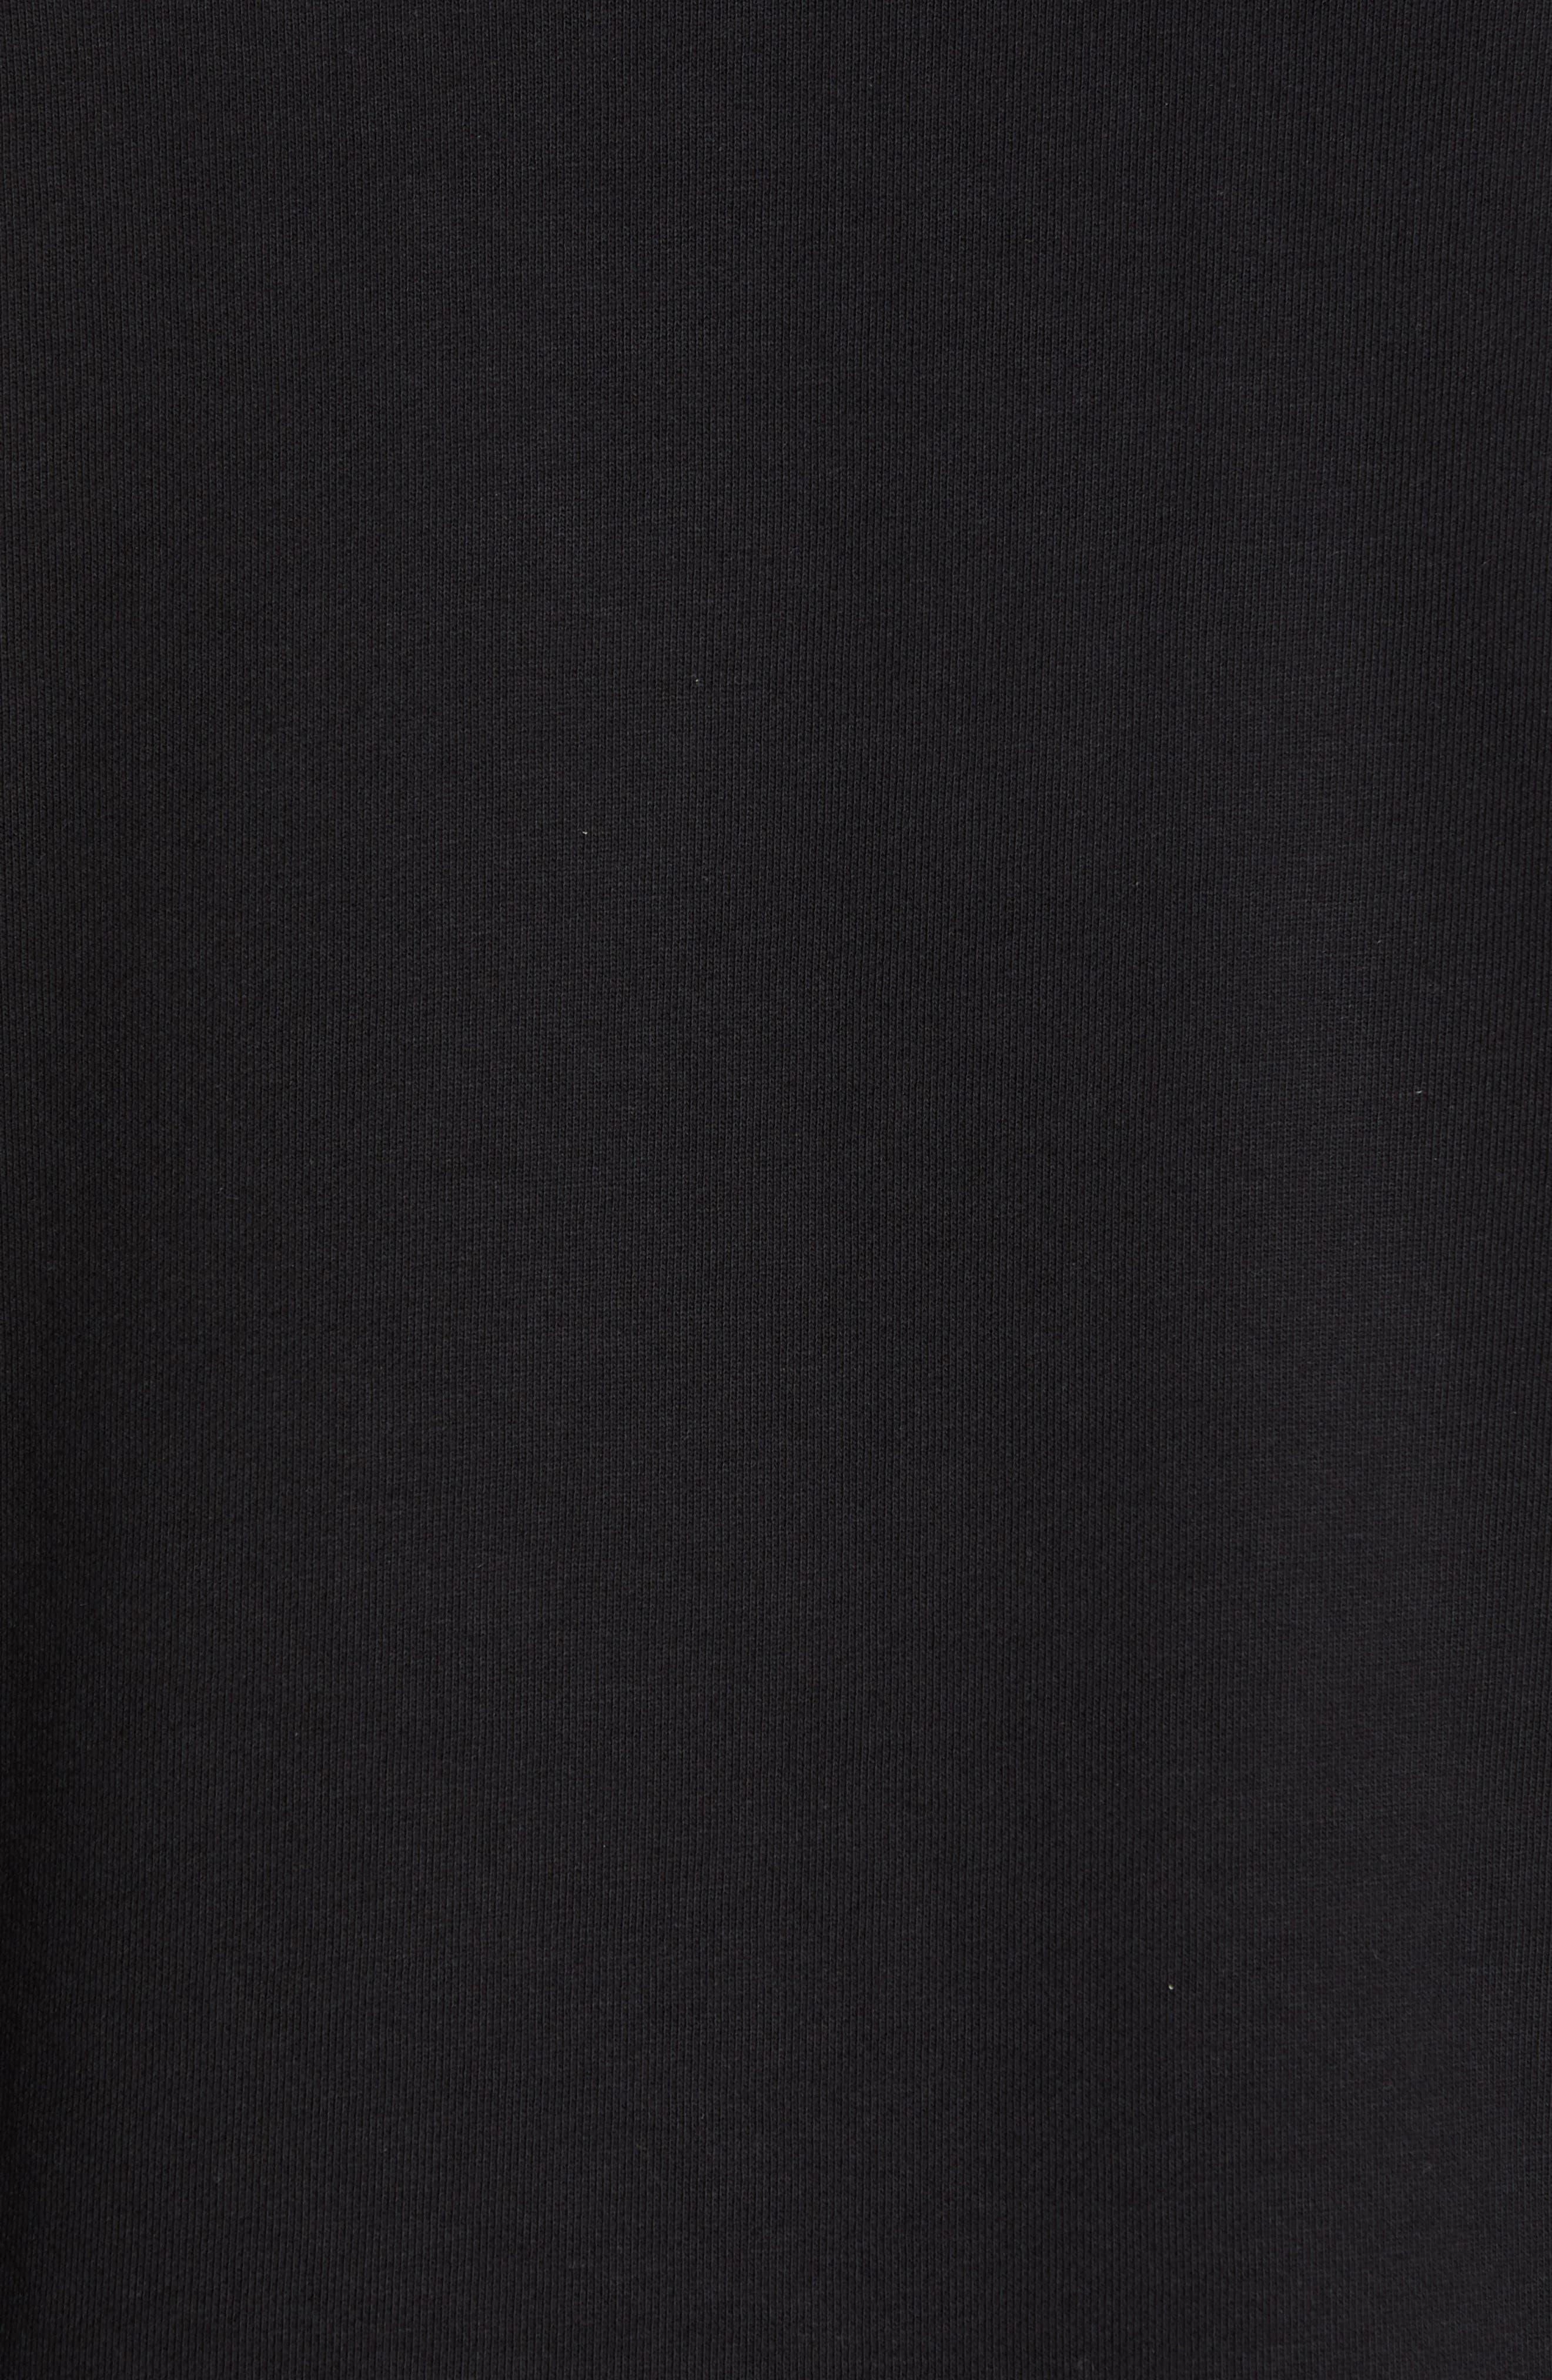 Maglia Sweatshirt,                             Alternate thumbnail 5, color,                             BLACK